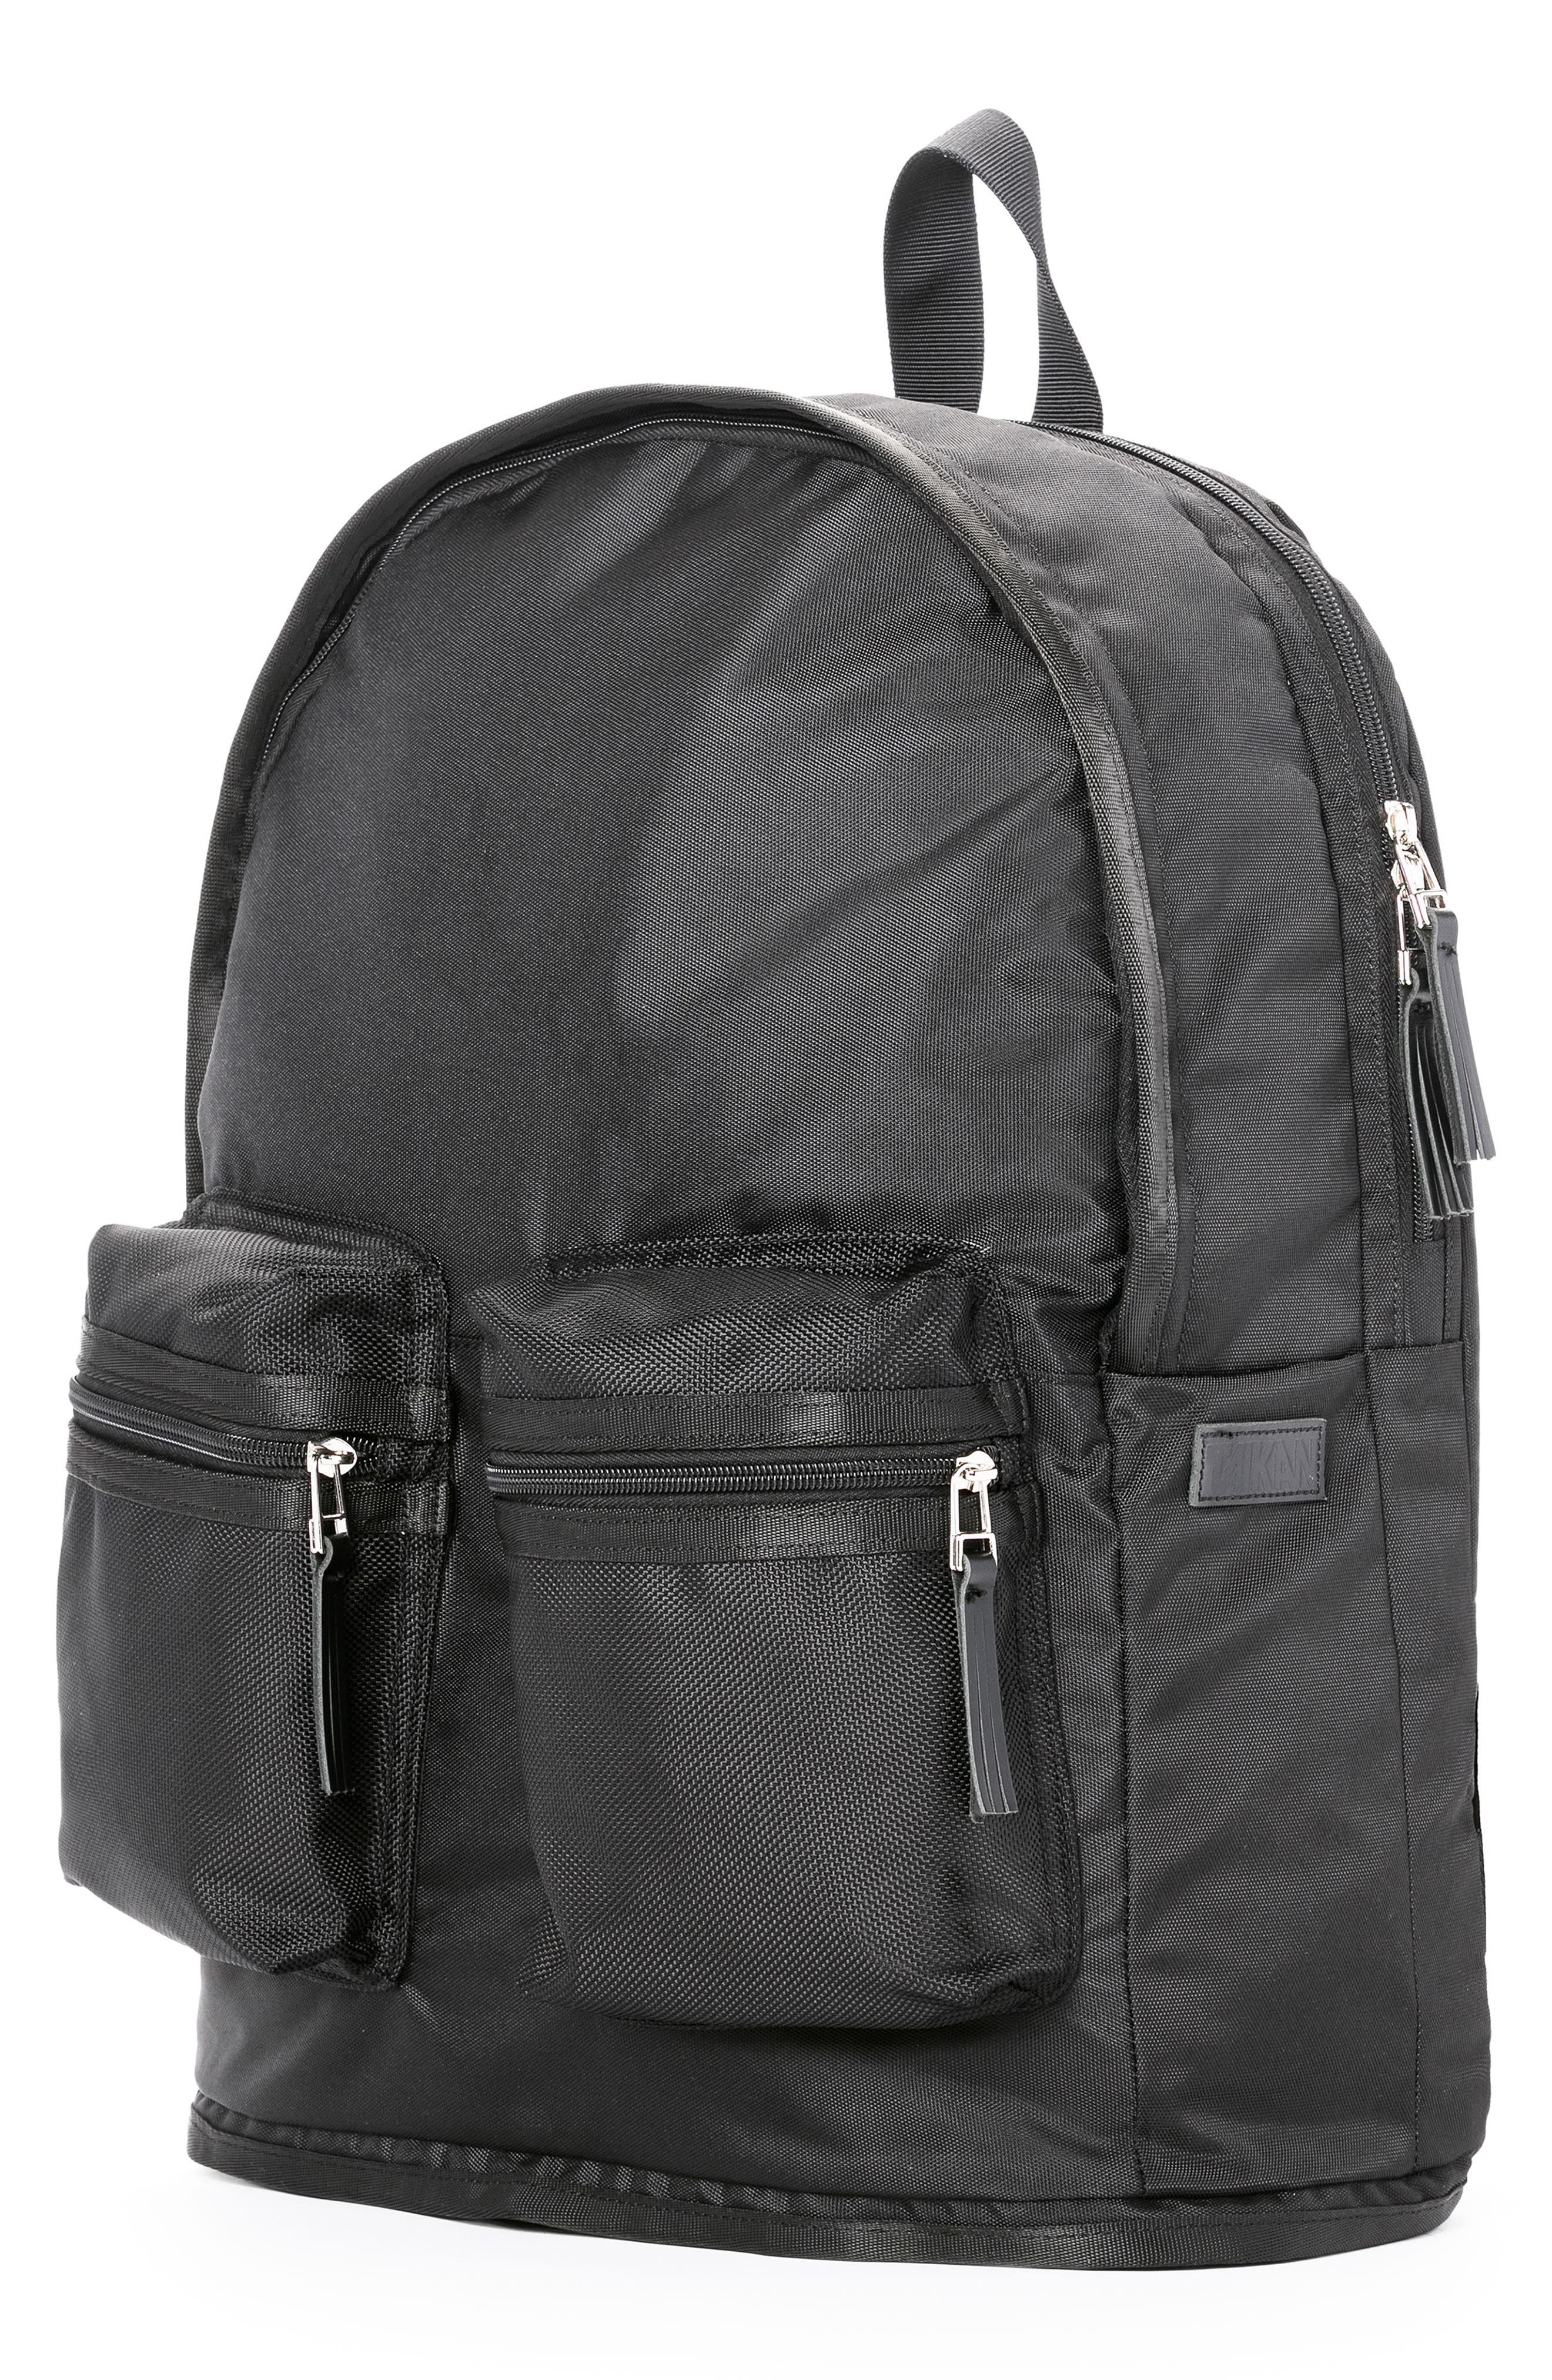 TAIKAN,                             Spartan Backpack,                             Alternate thumbnail 4, color,                             001